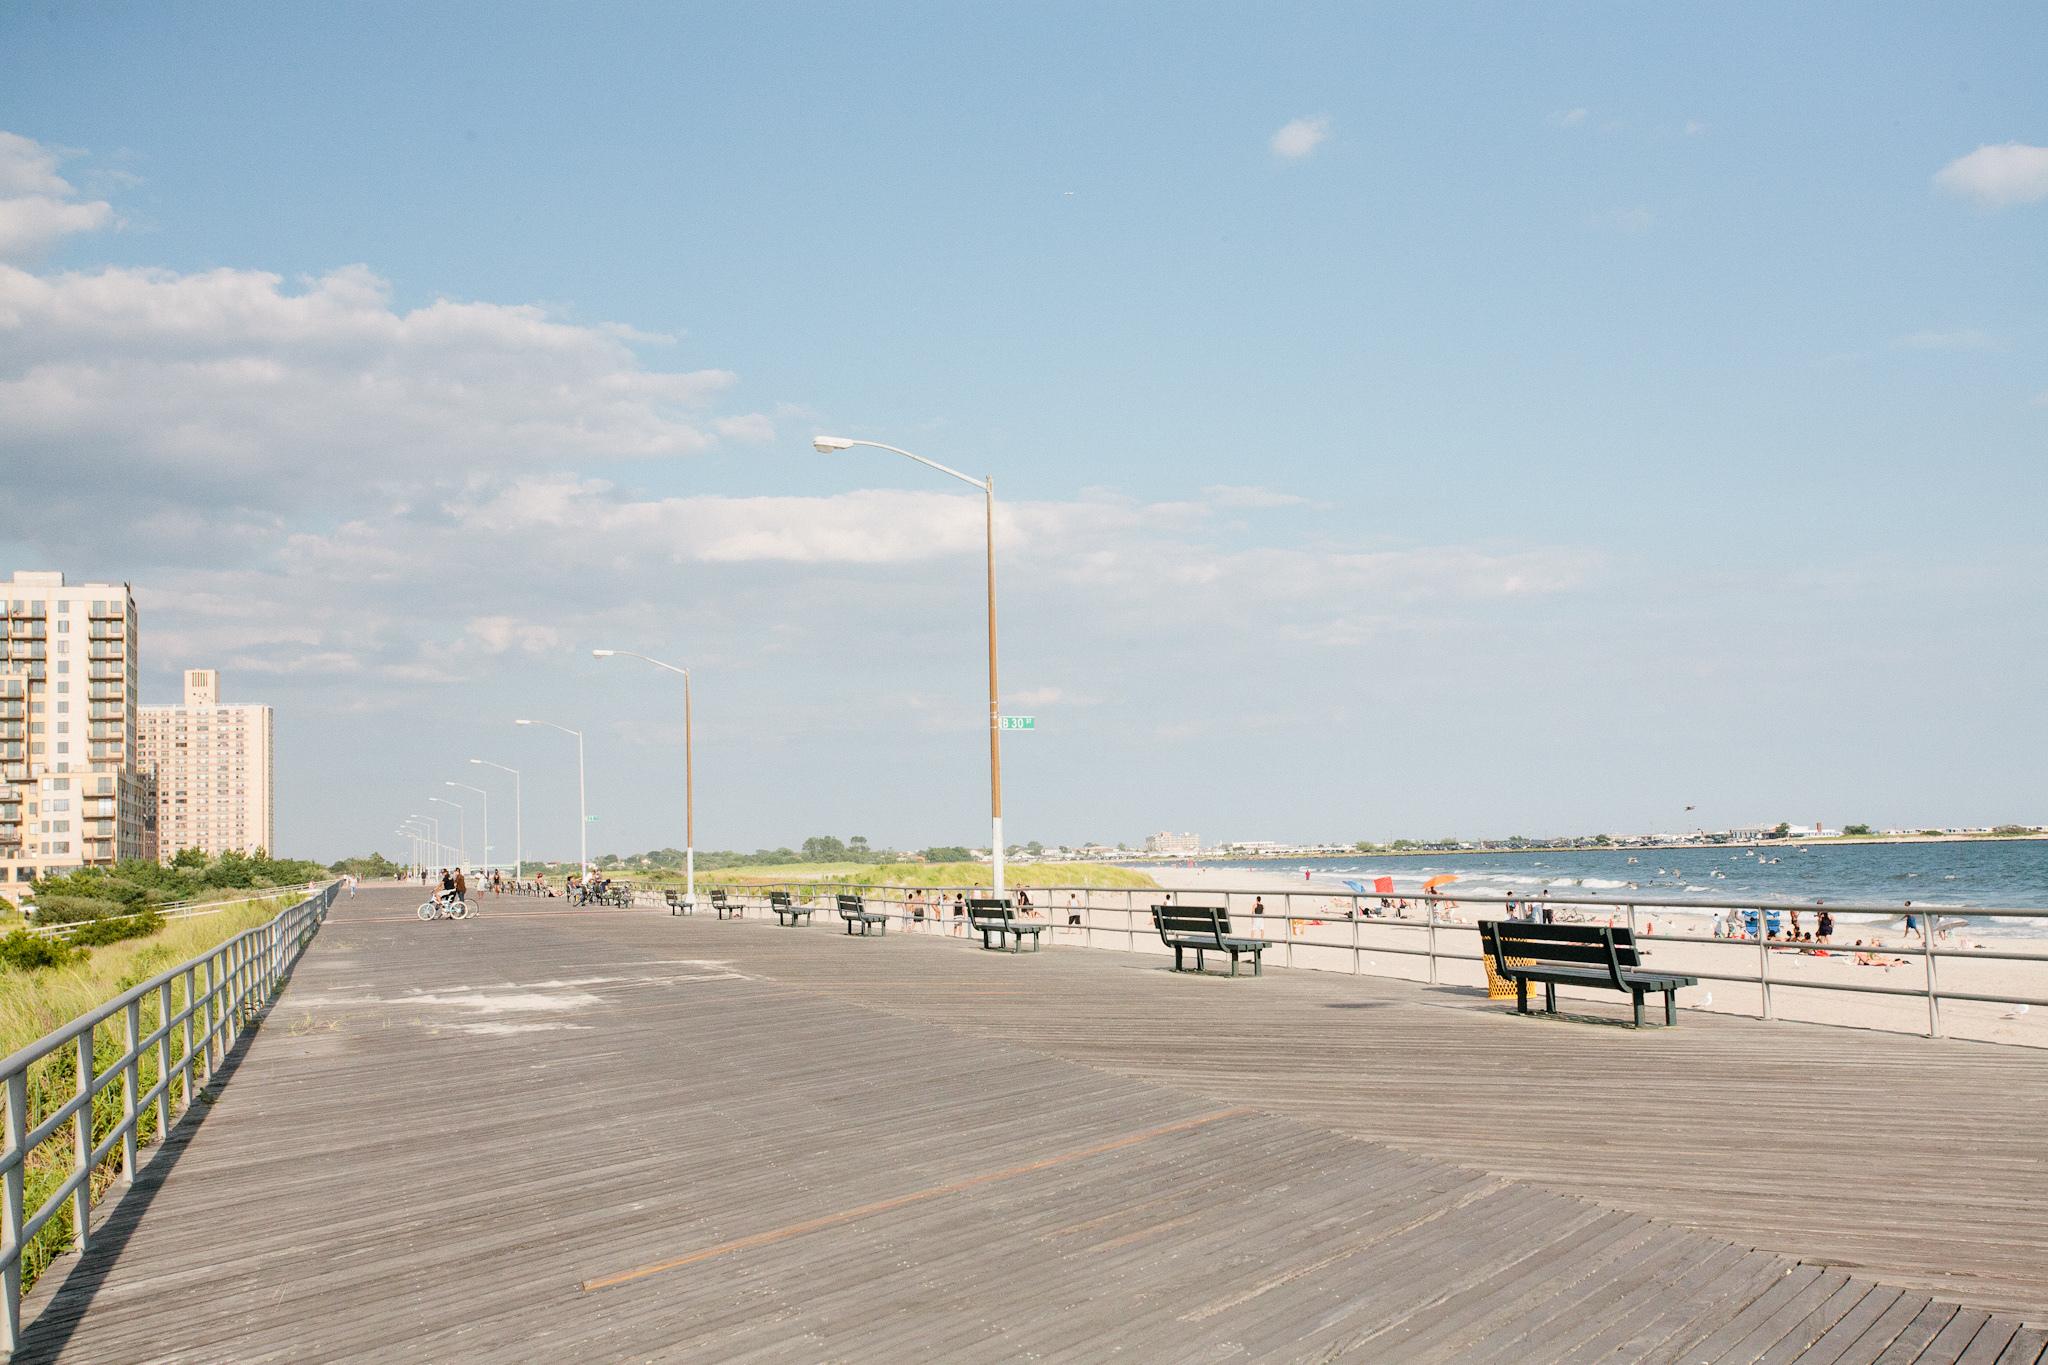 Rockaway Park and Playground